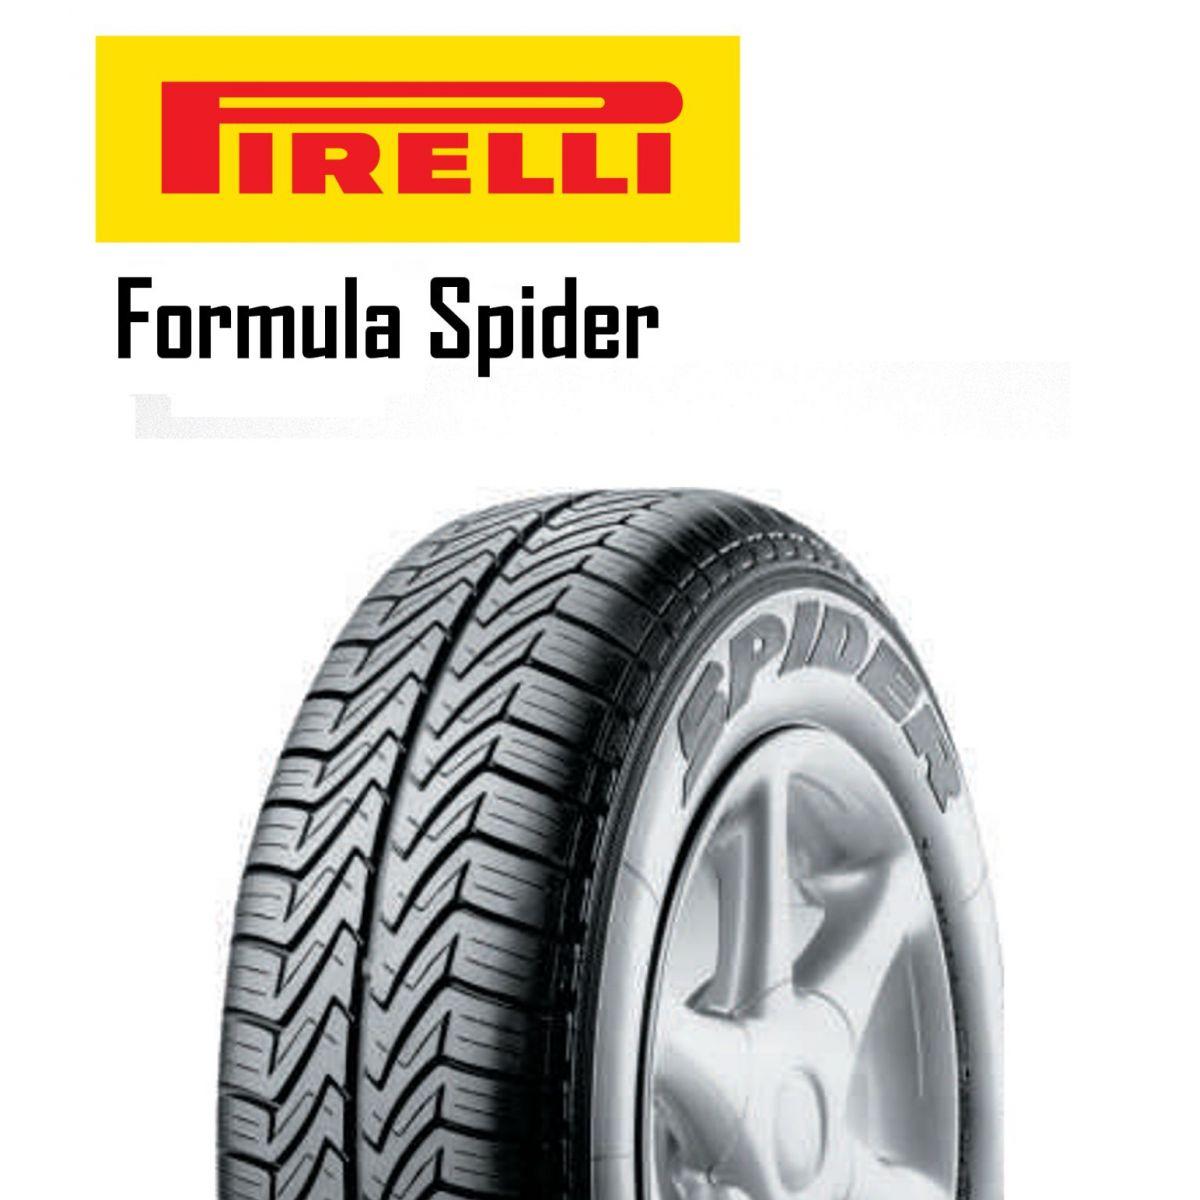 Pneu 185/65r14 86t Formula Spider Pirelli Outlet